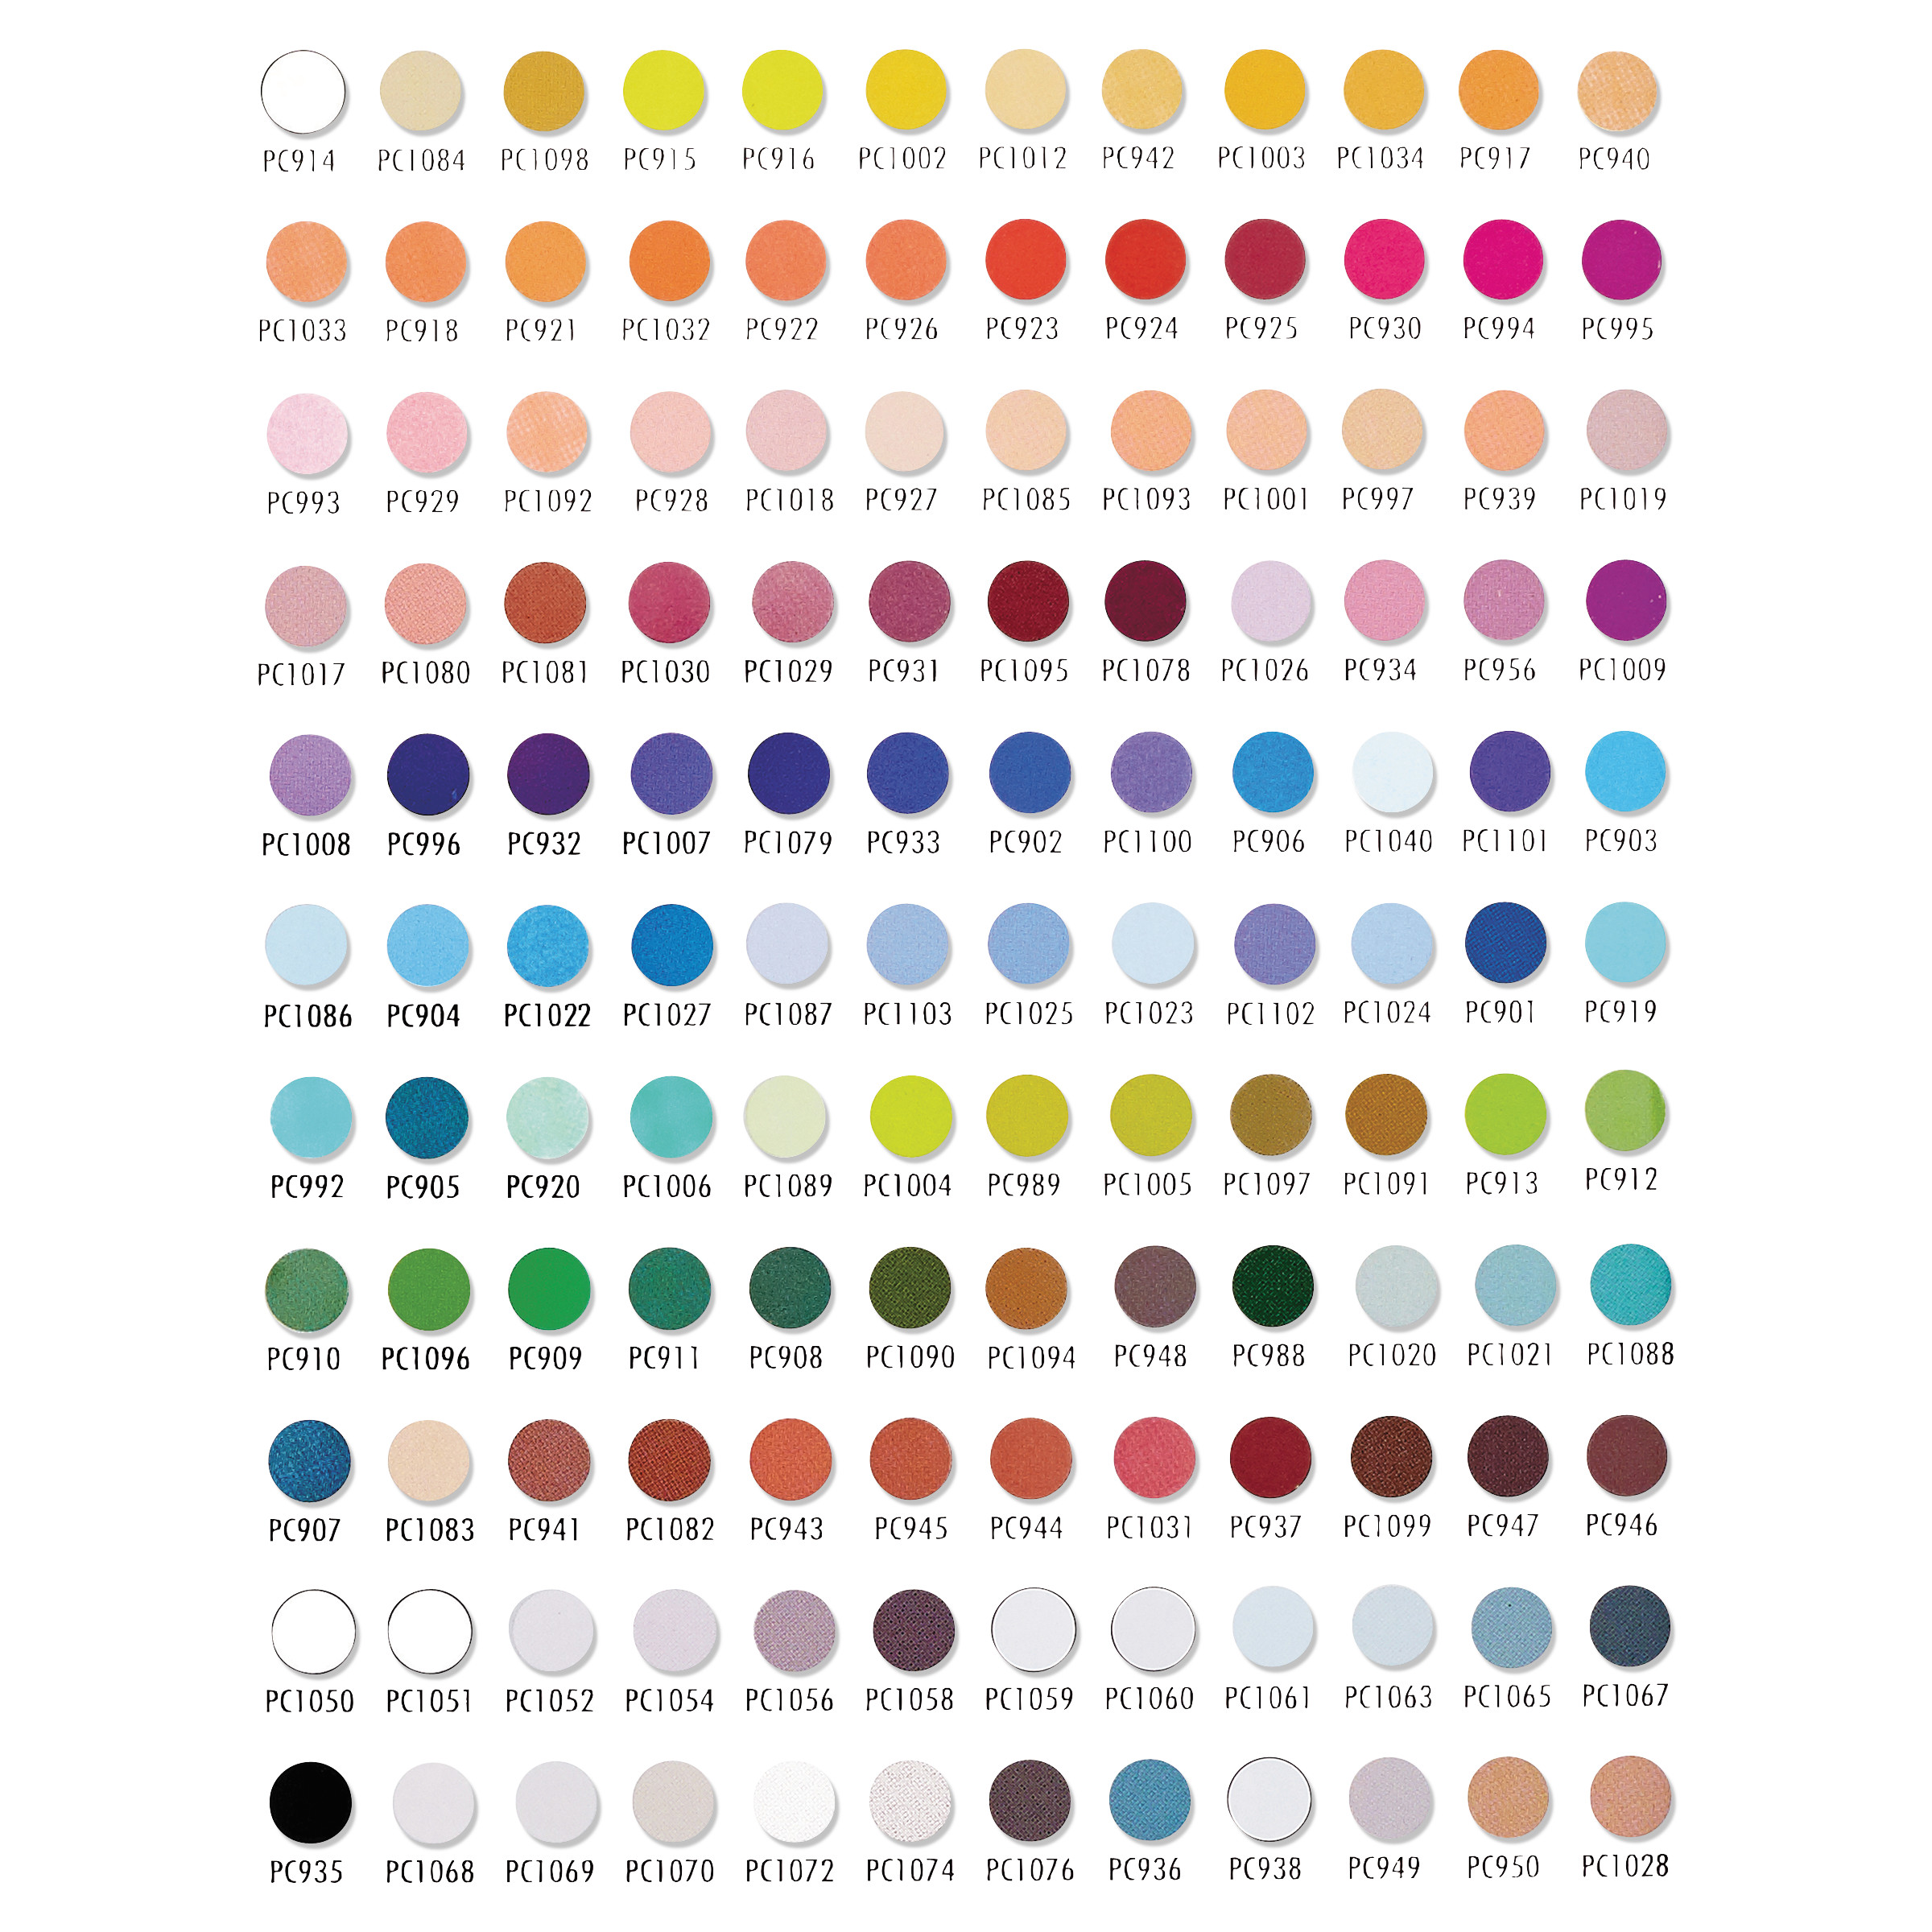 Prismacolor colored art pencil set 132 pieces walmart nvjuhfo Image collections